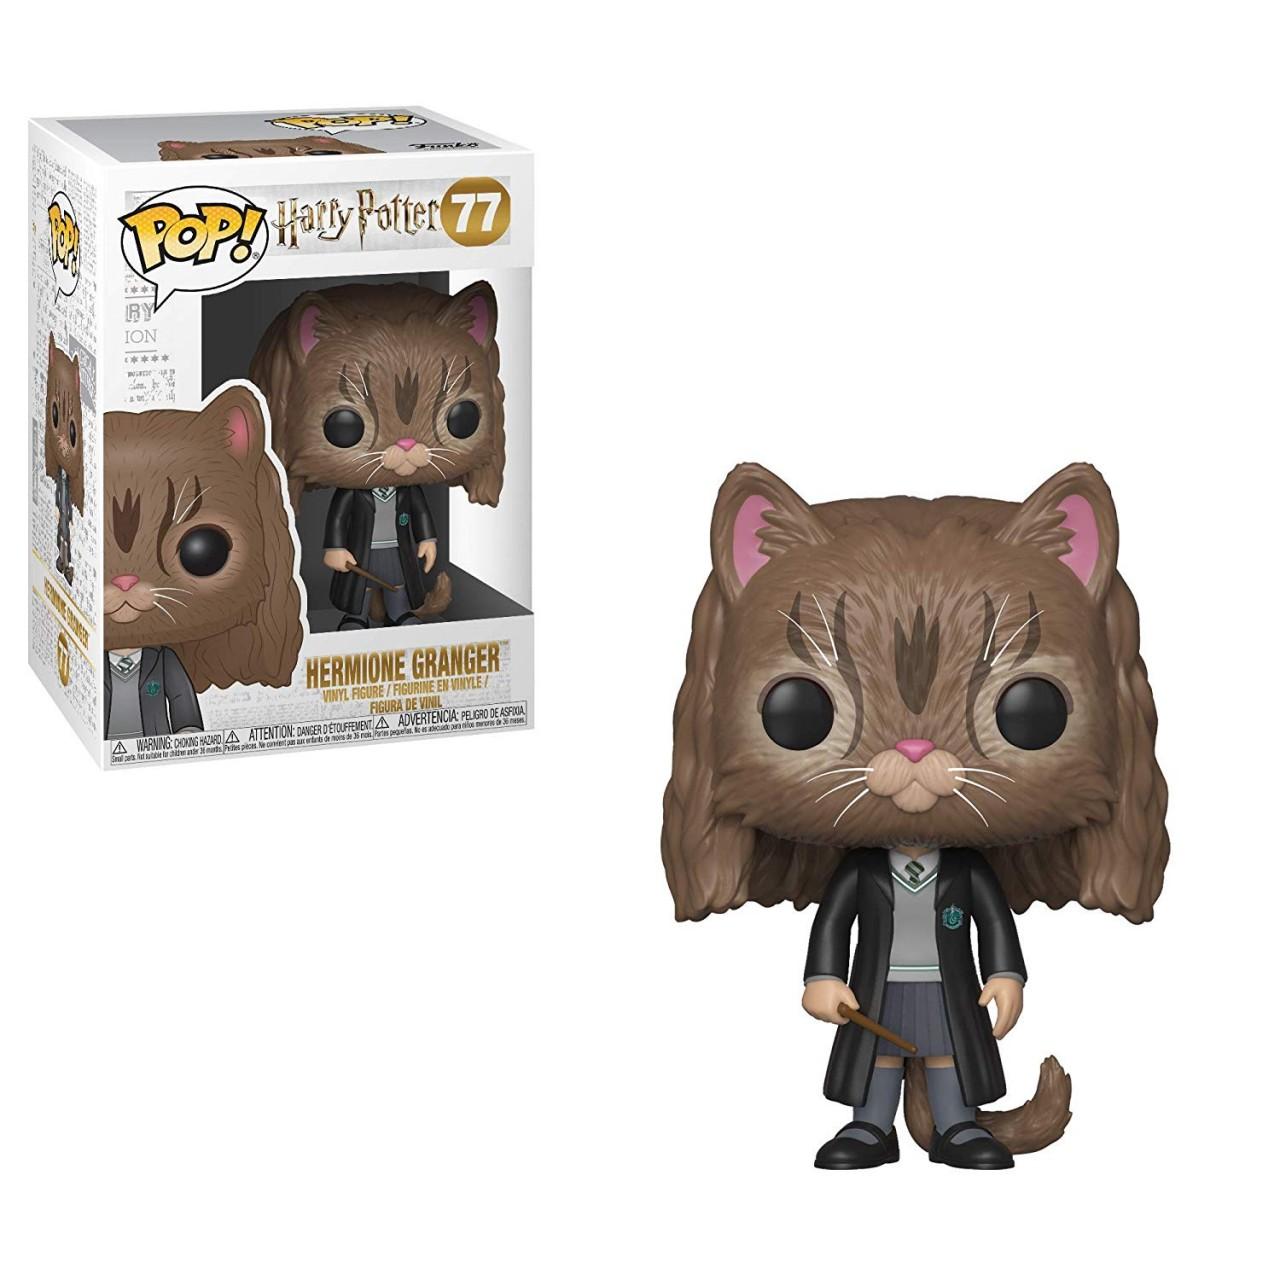 Фигурка Funko Pop Гарри Поттер - Гермиона в обличии Кошки #77 (35509) Harry Potter Hermione as Cat Pop